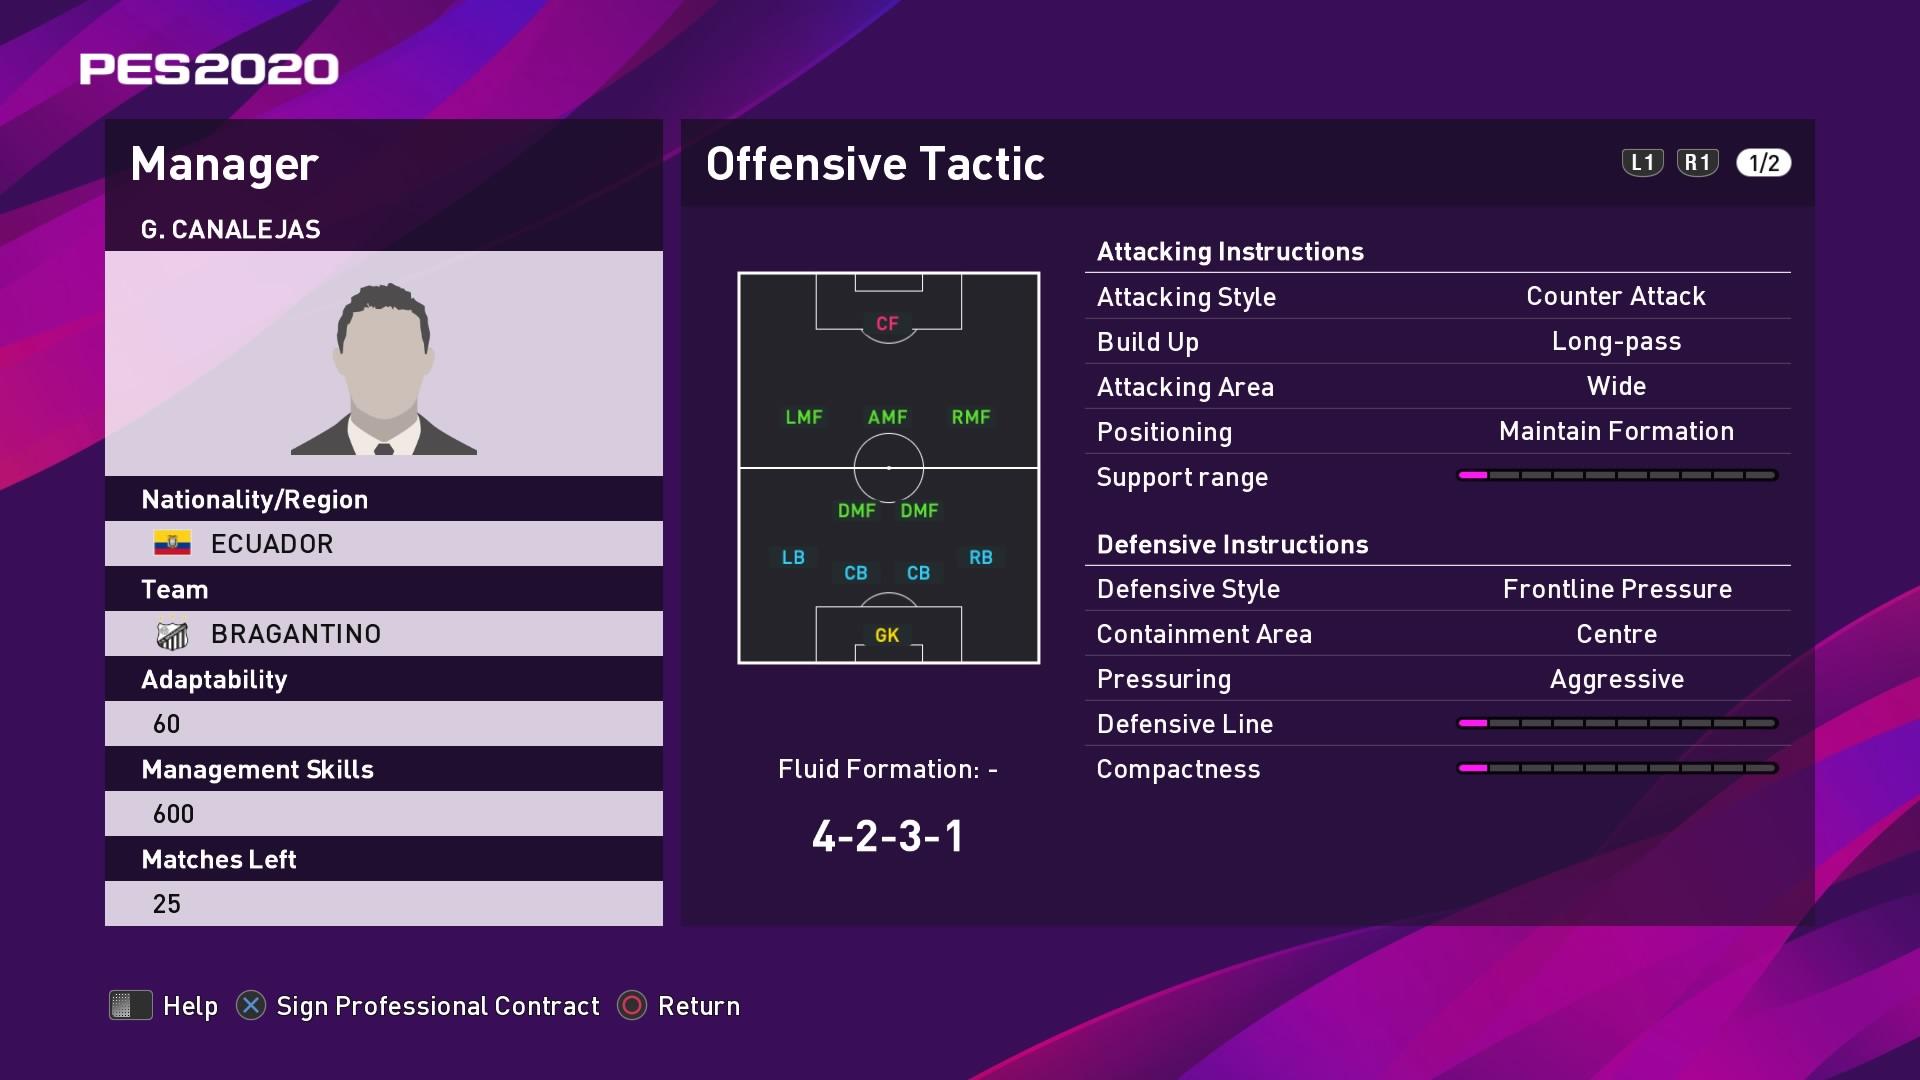 G. Canalejas (Vinicius Munhoz) Offensive Tactic in PES 2020 myClub